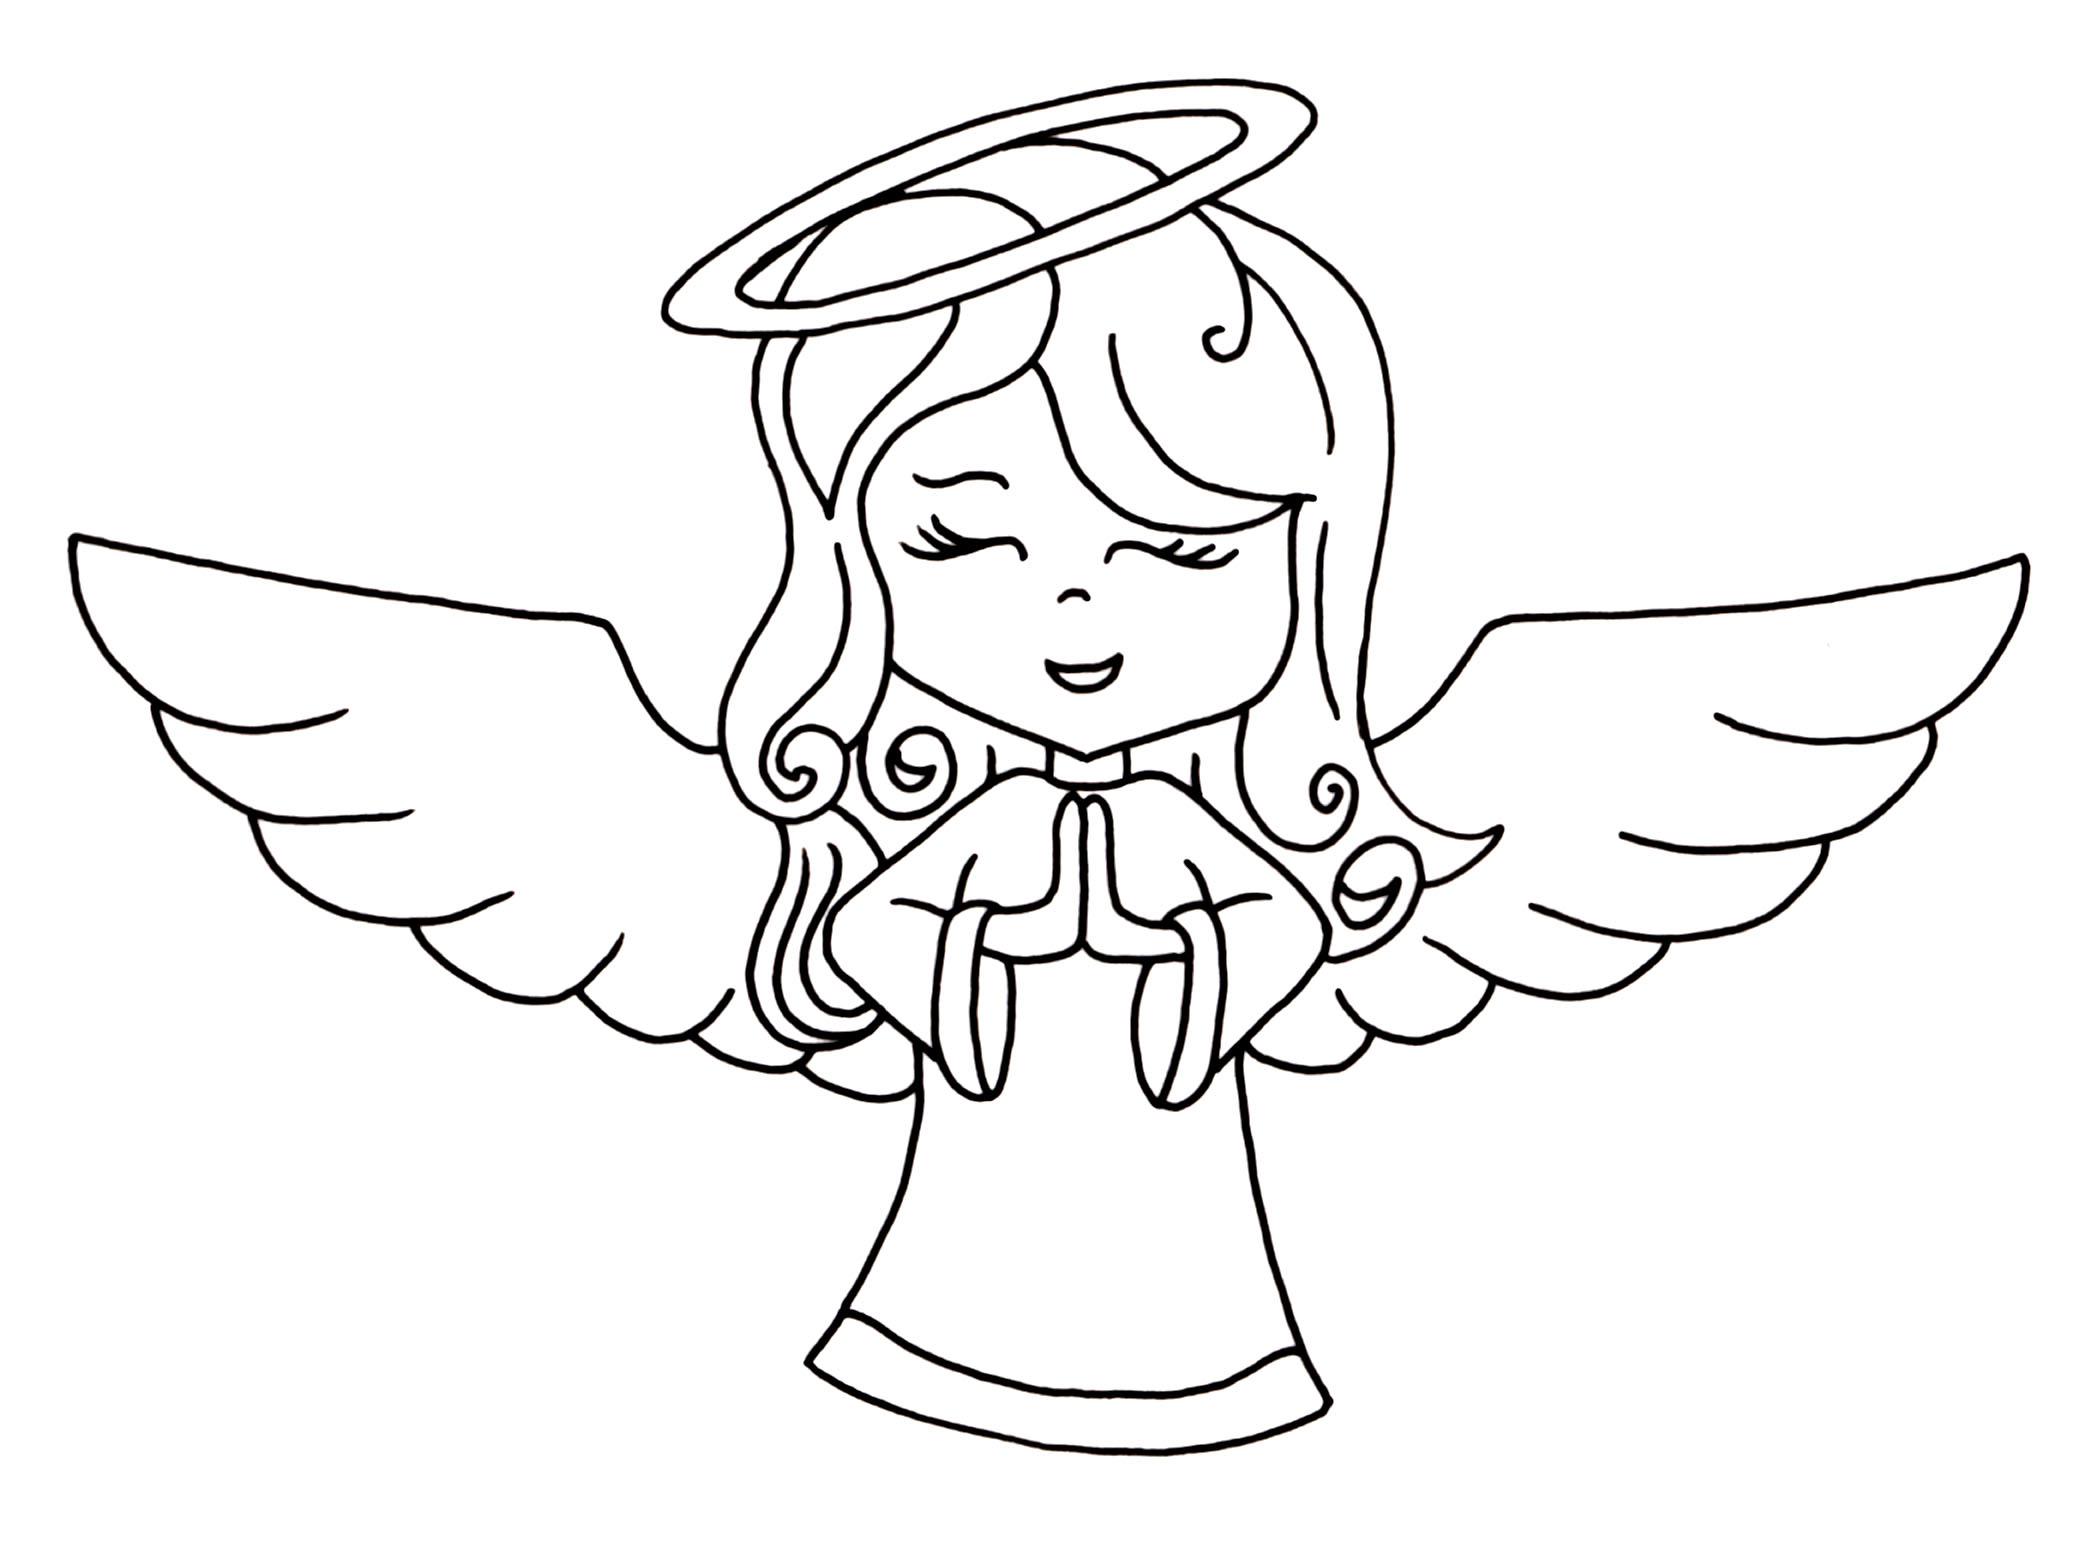 2098x1542 Line Drawings Of Angels Angel Line Art Free Download Clip Art